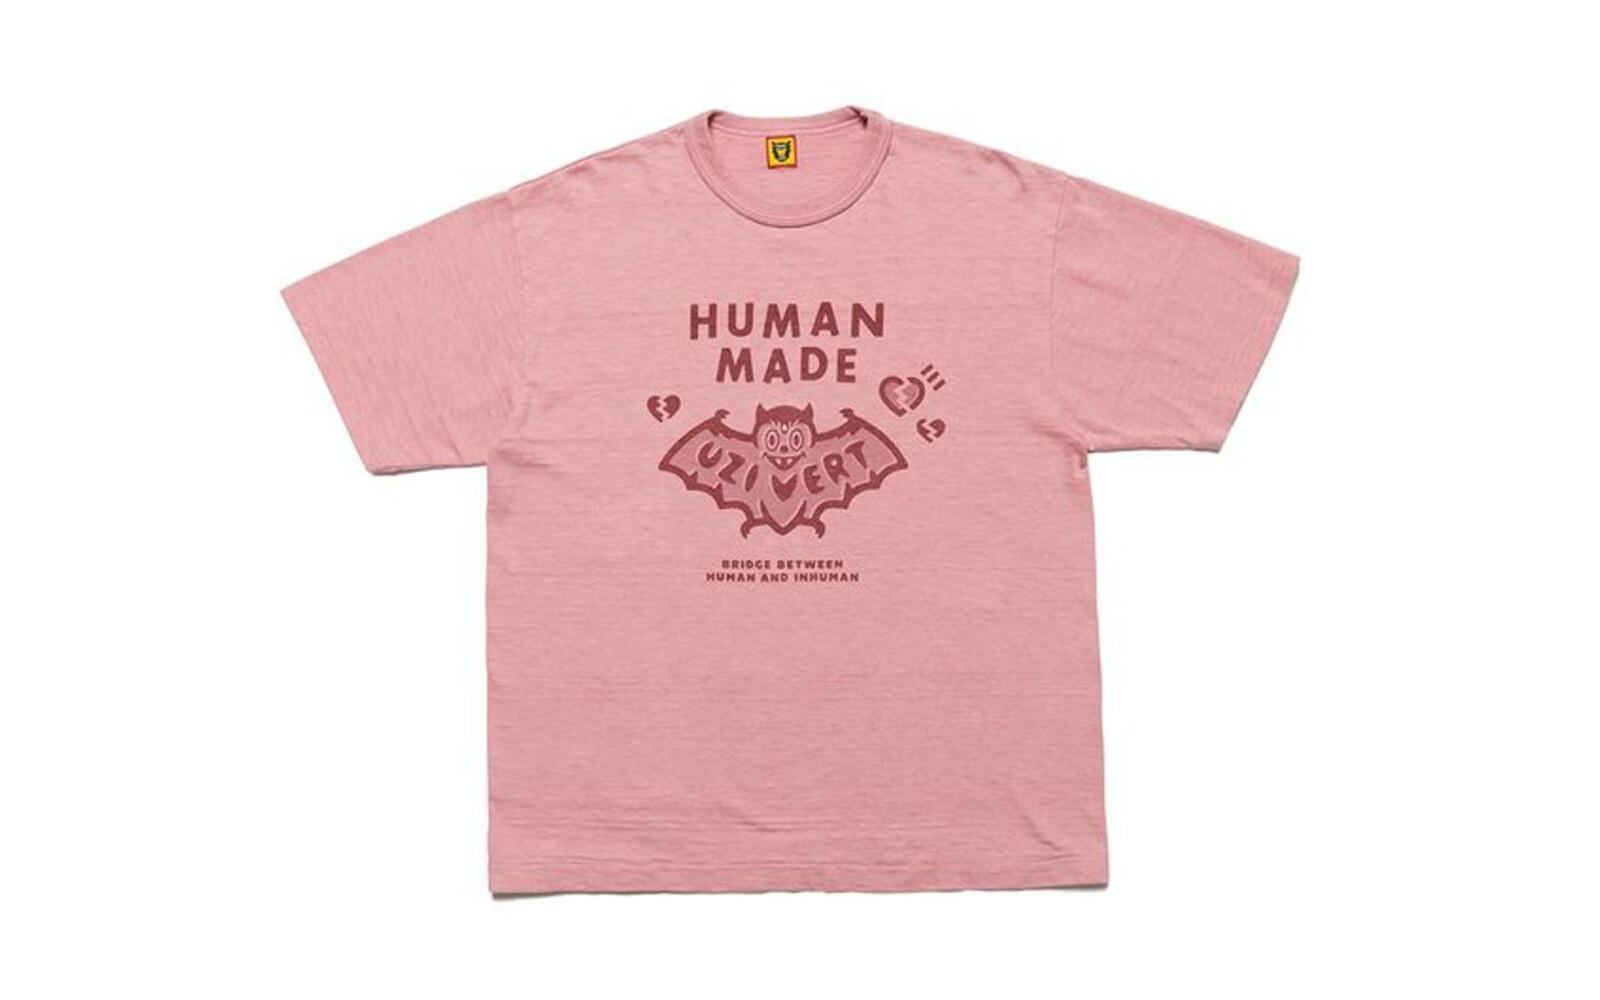 Lil Uzi Vert x Human Made Collaborazione